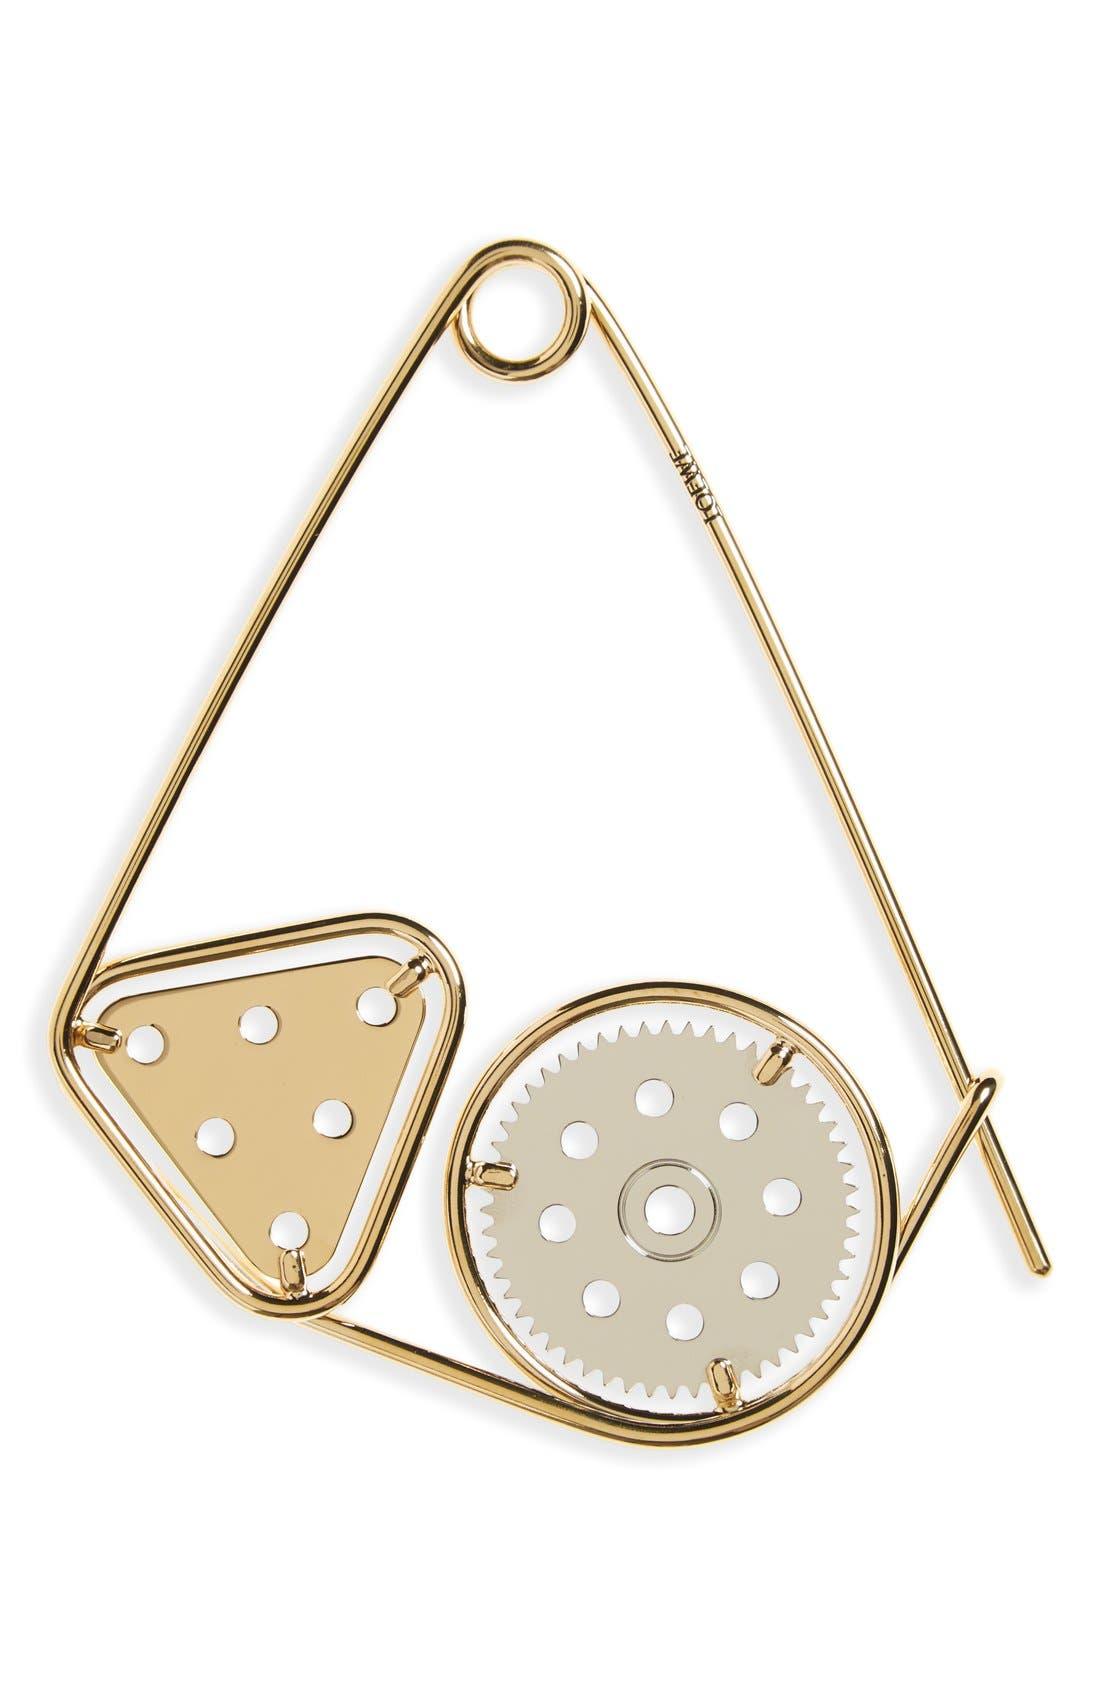 'Meccano' Double Pin Bag Charm,                             Main thumbnail 1, color,                             710